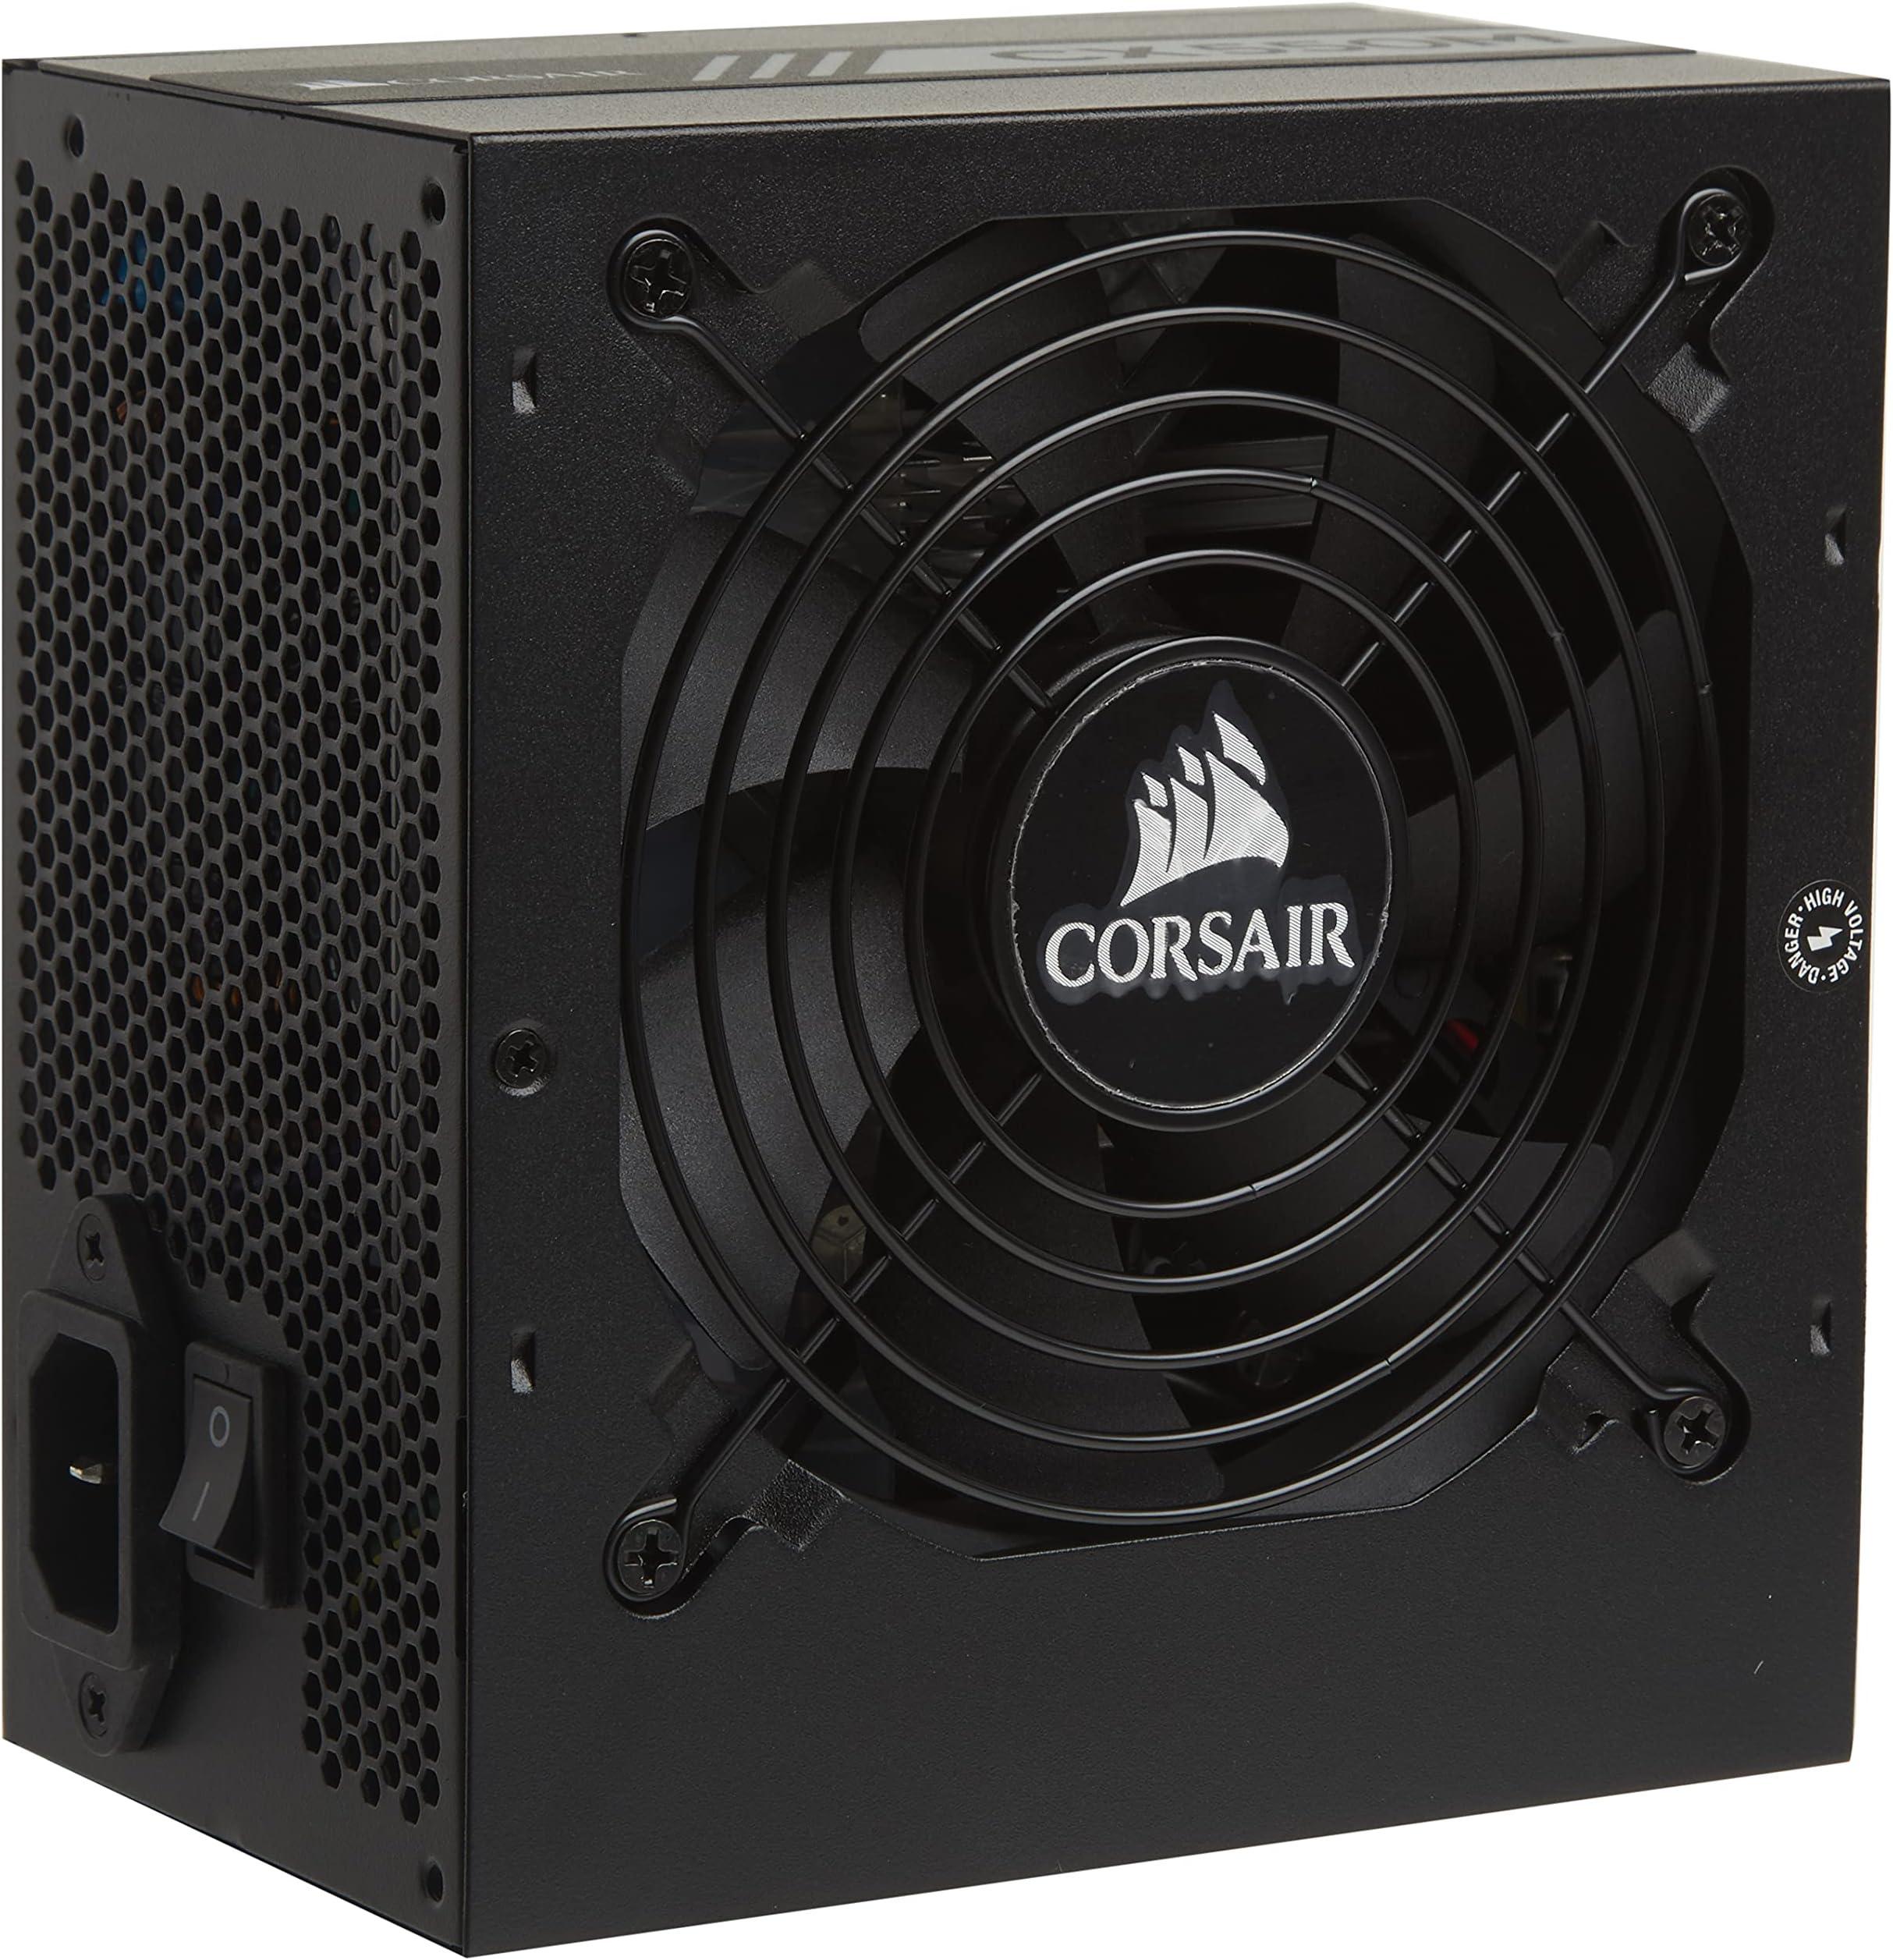 Corsair CX Series 550 Watt 80 Plus Bronze Certified Modular Power Supply (CP-9020102-NA)